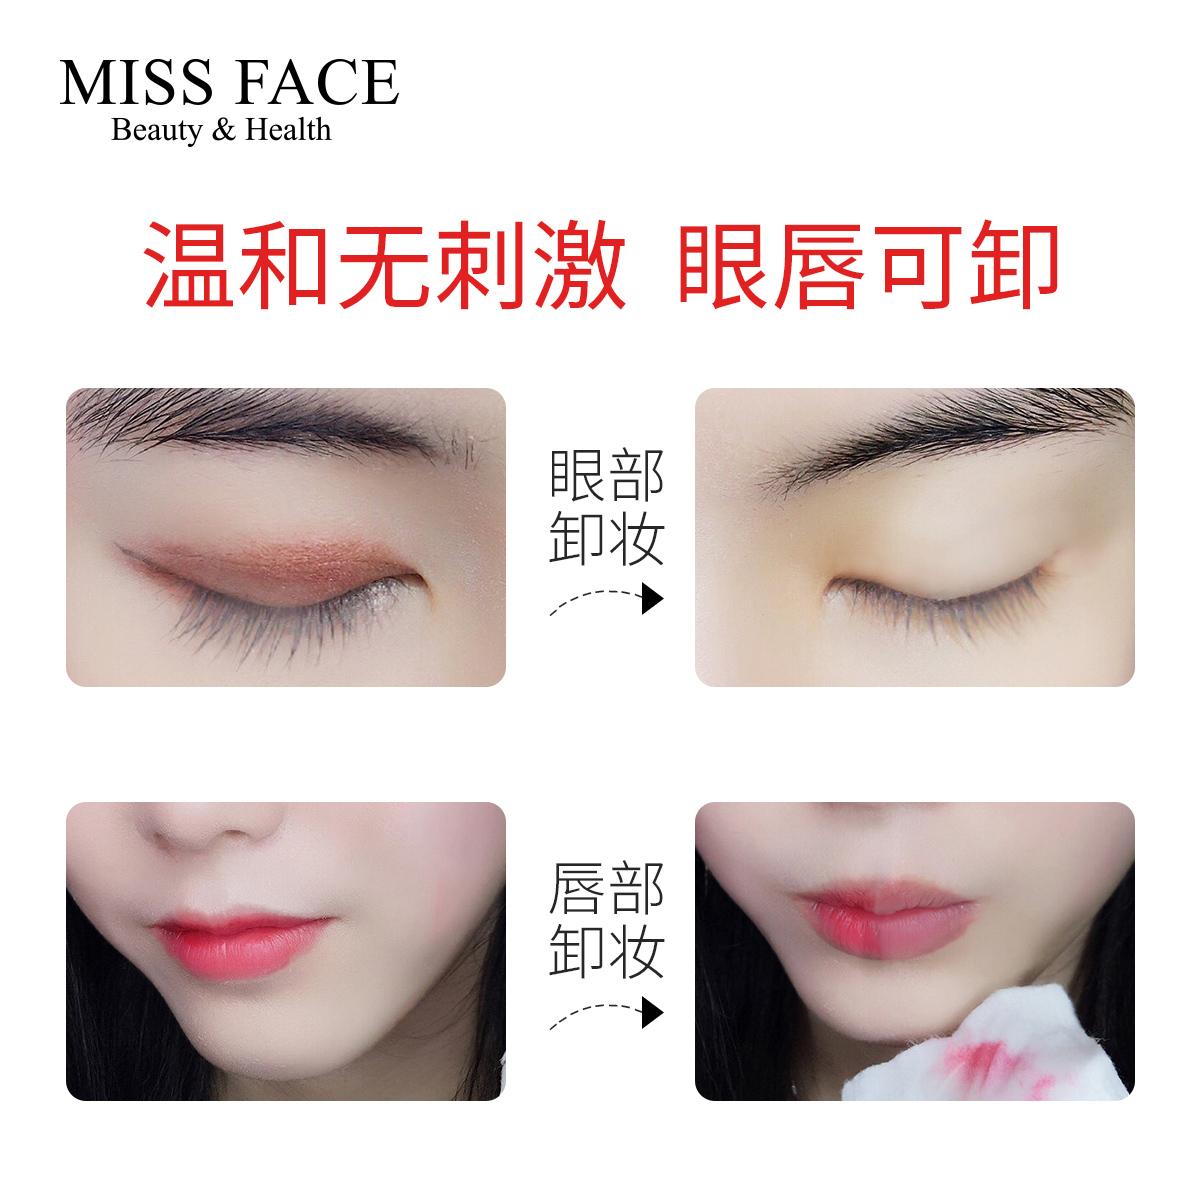 Miss face卸妆水脸部温和 无刺激深层清洁彩妆学生眼唇卸妆液正品